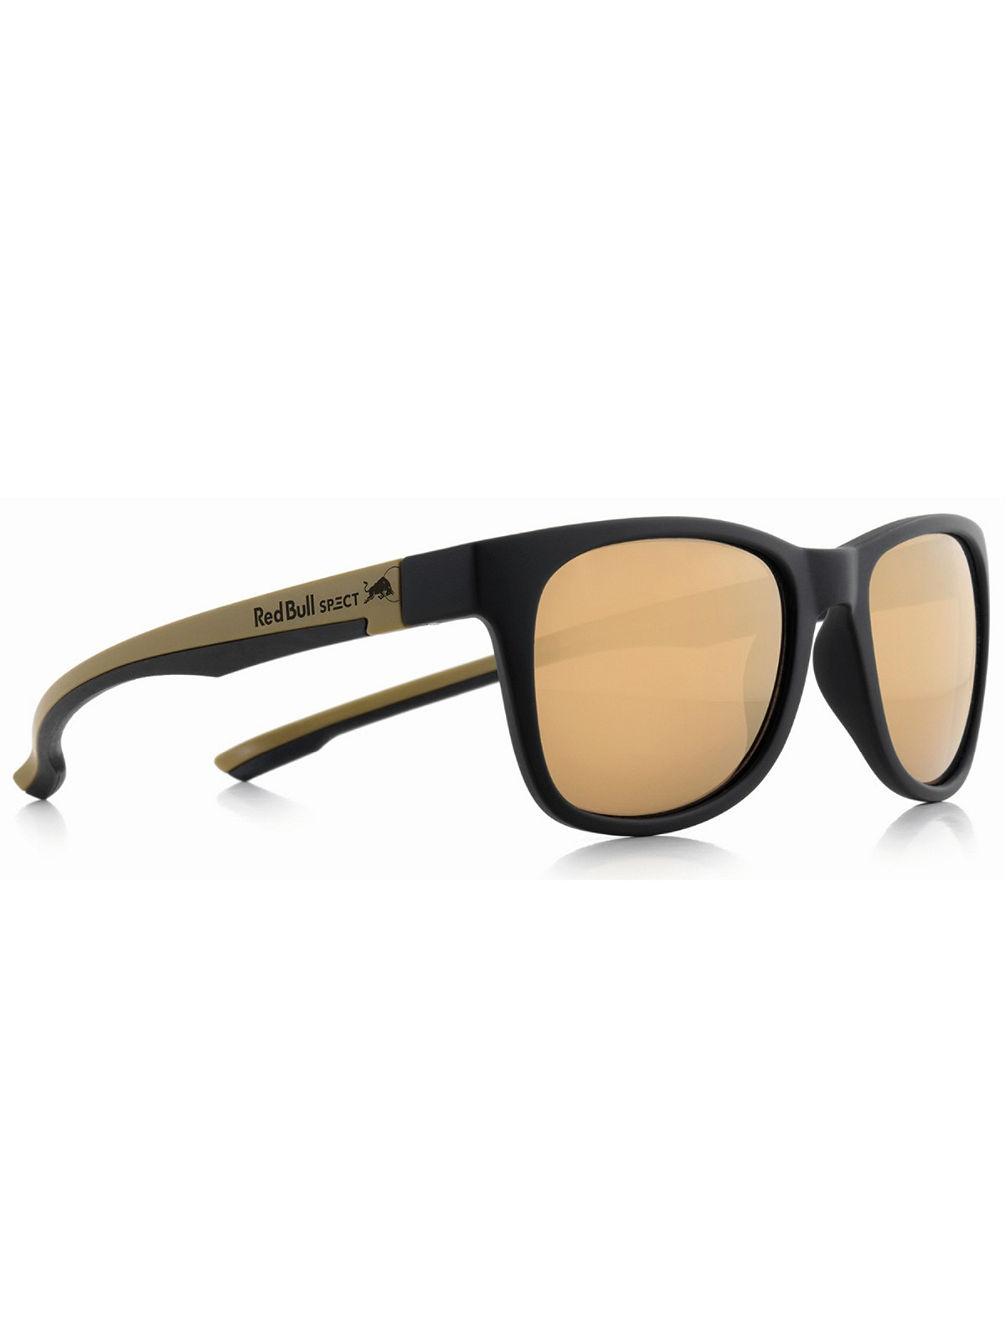 aef016c743 Buy Red Bull SPECT Eyewear Indy Matte Black Matte Gold Temple Black ...